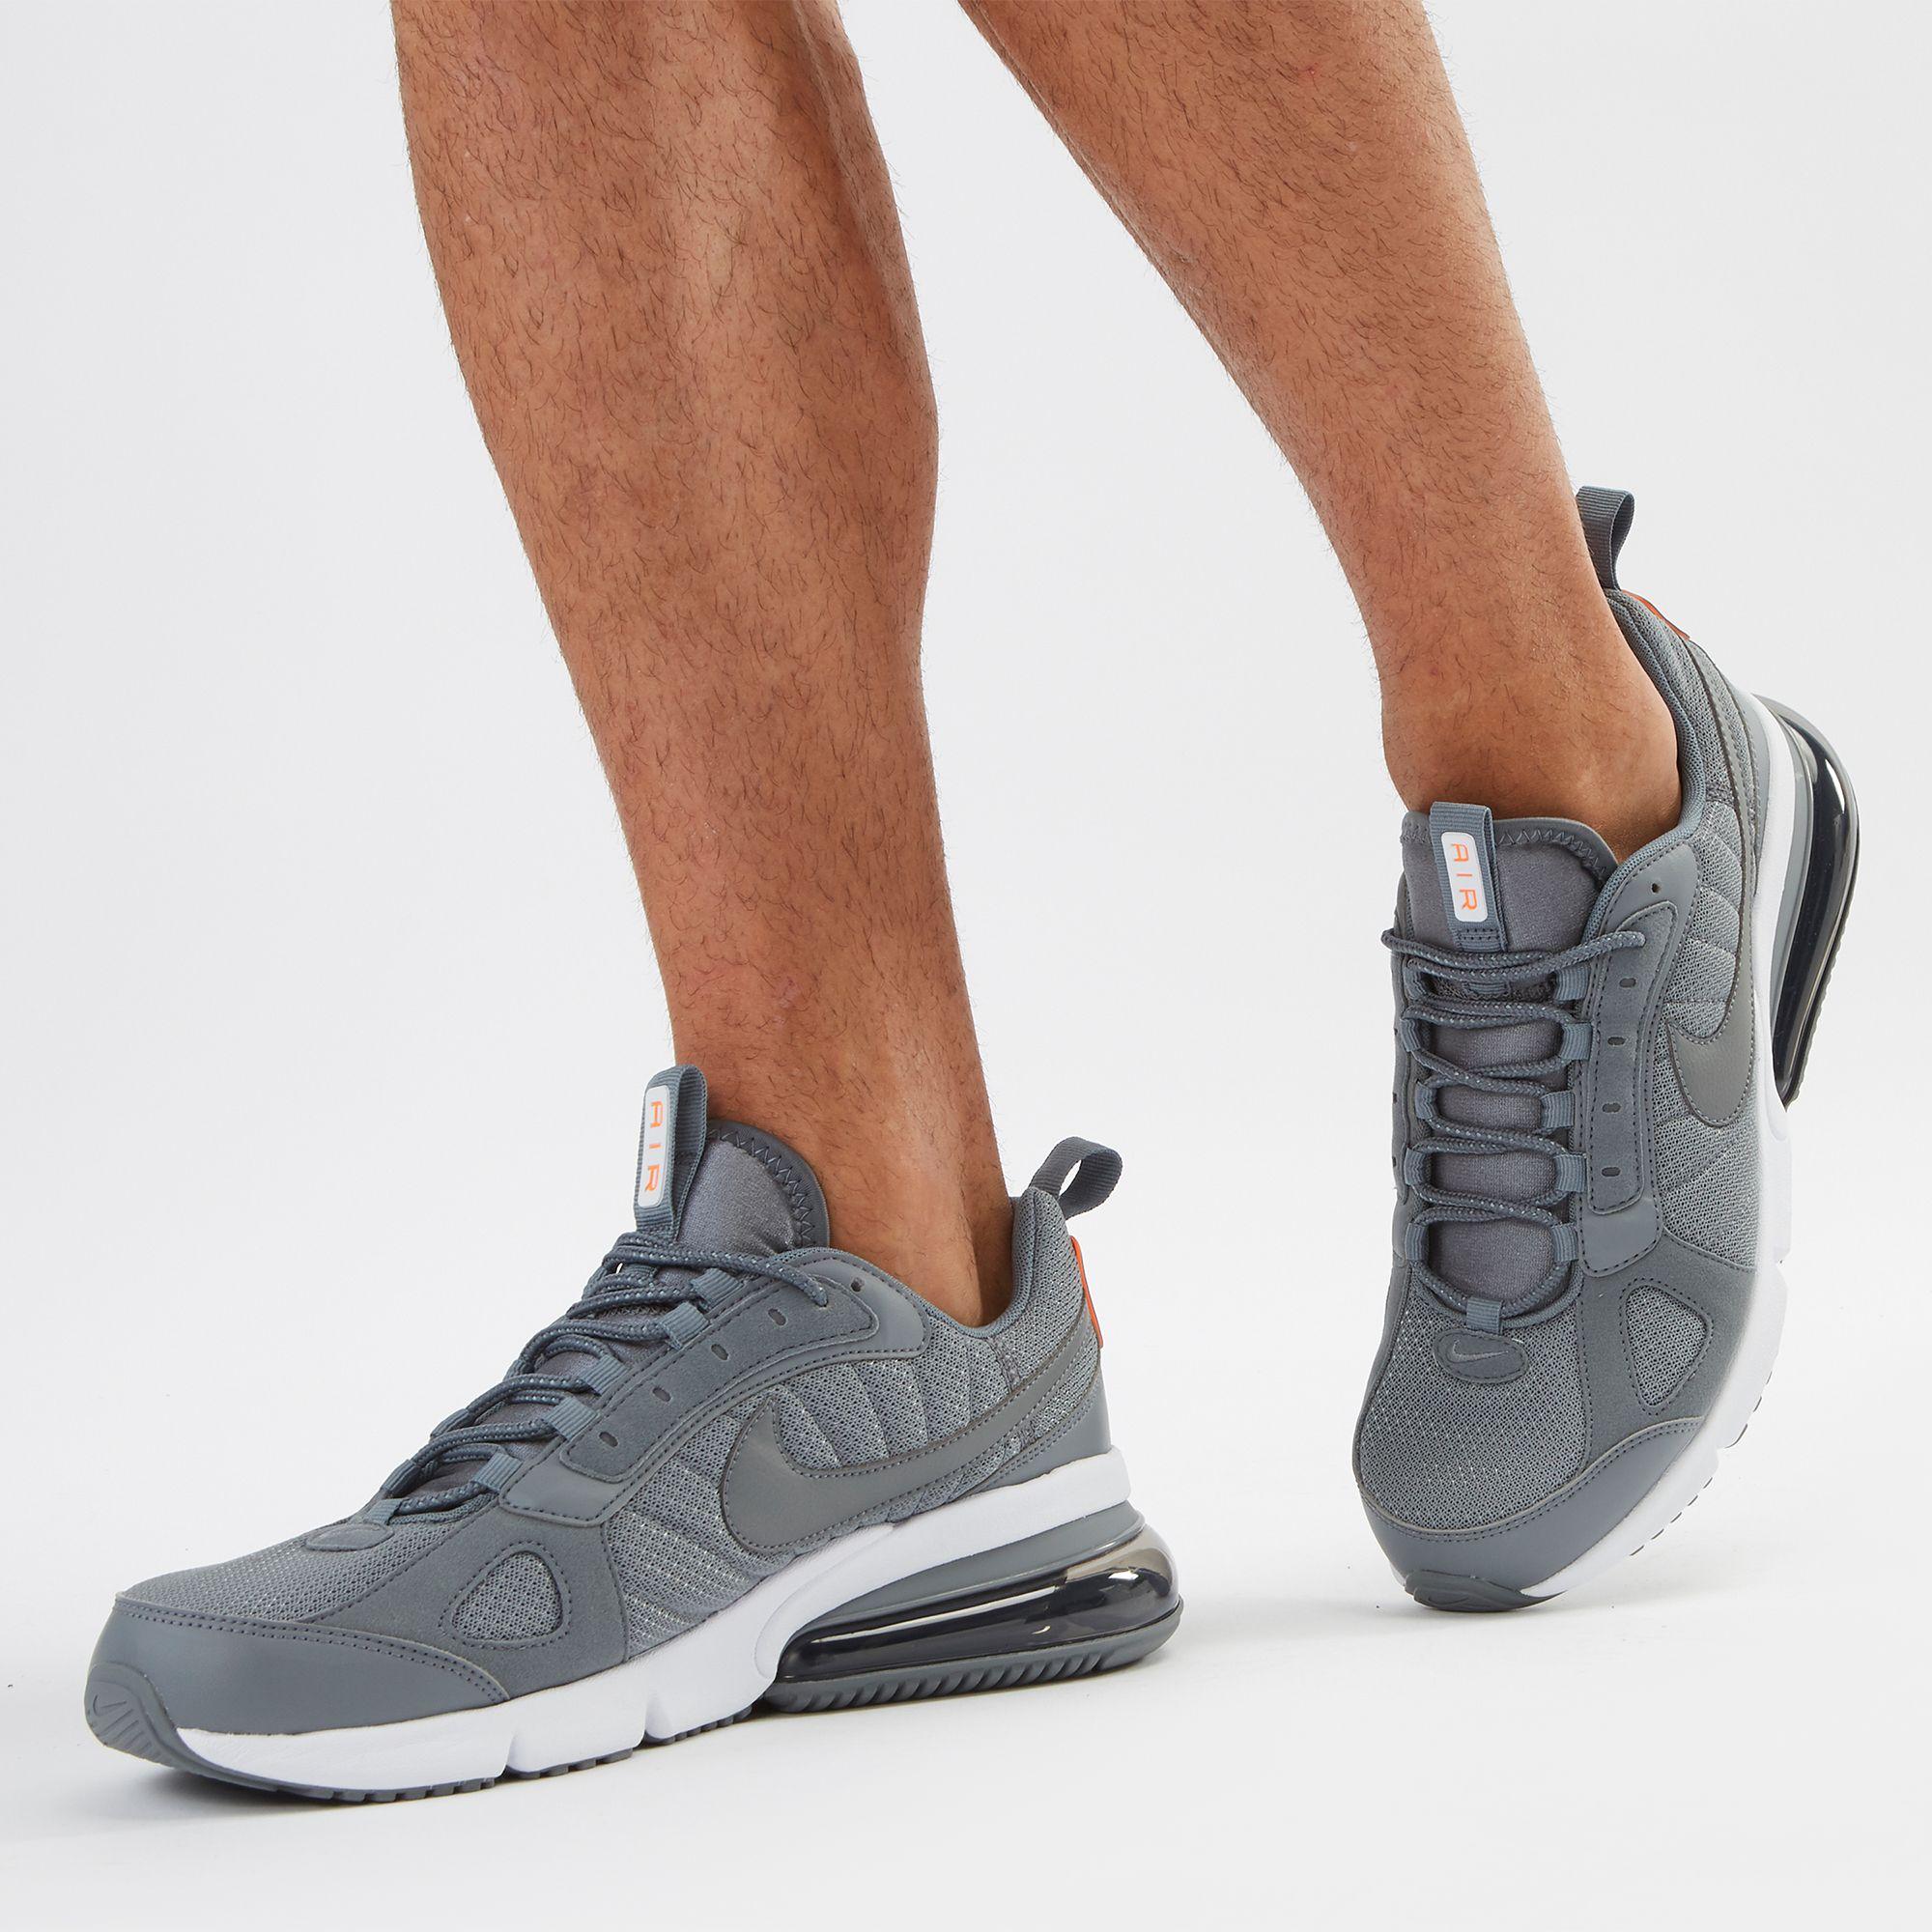 barba inyectar pase a ver  men's nike air max 270 futura se casual shoes Cheap Nike Air Max Shoes